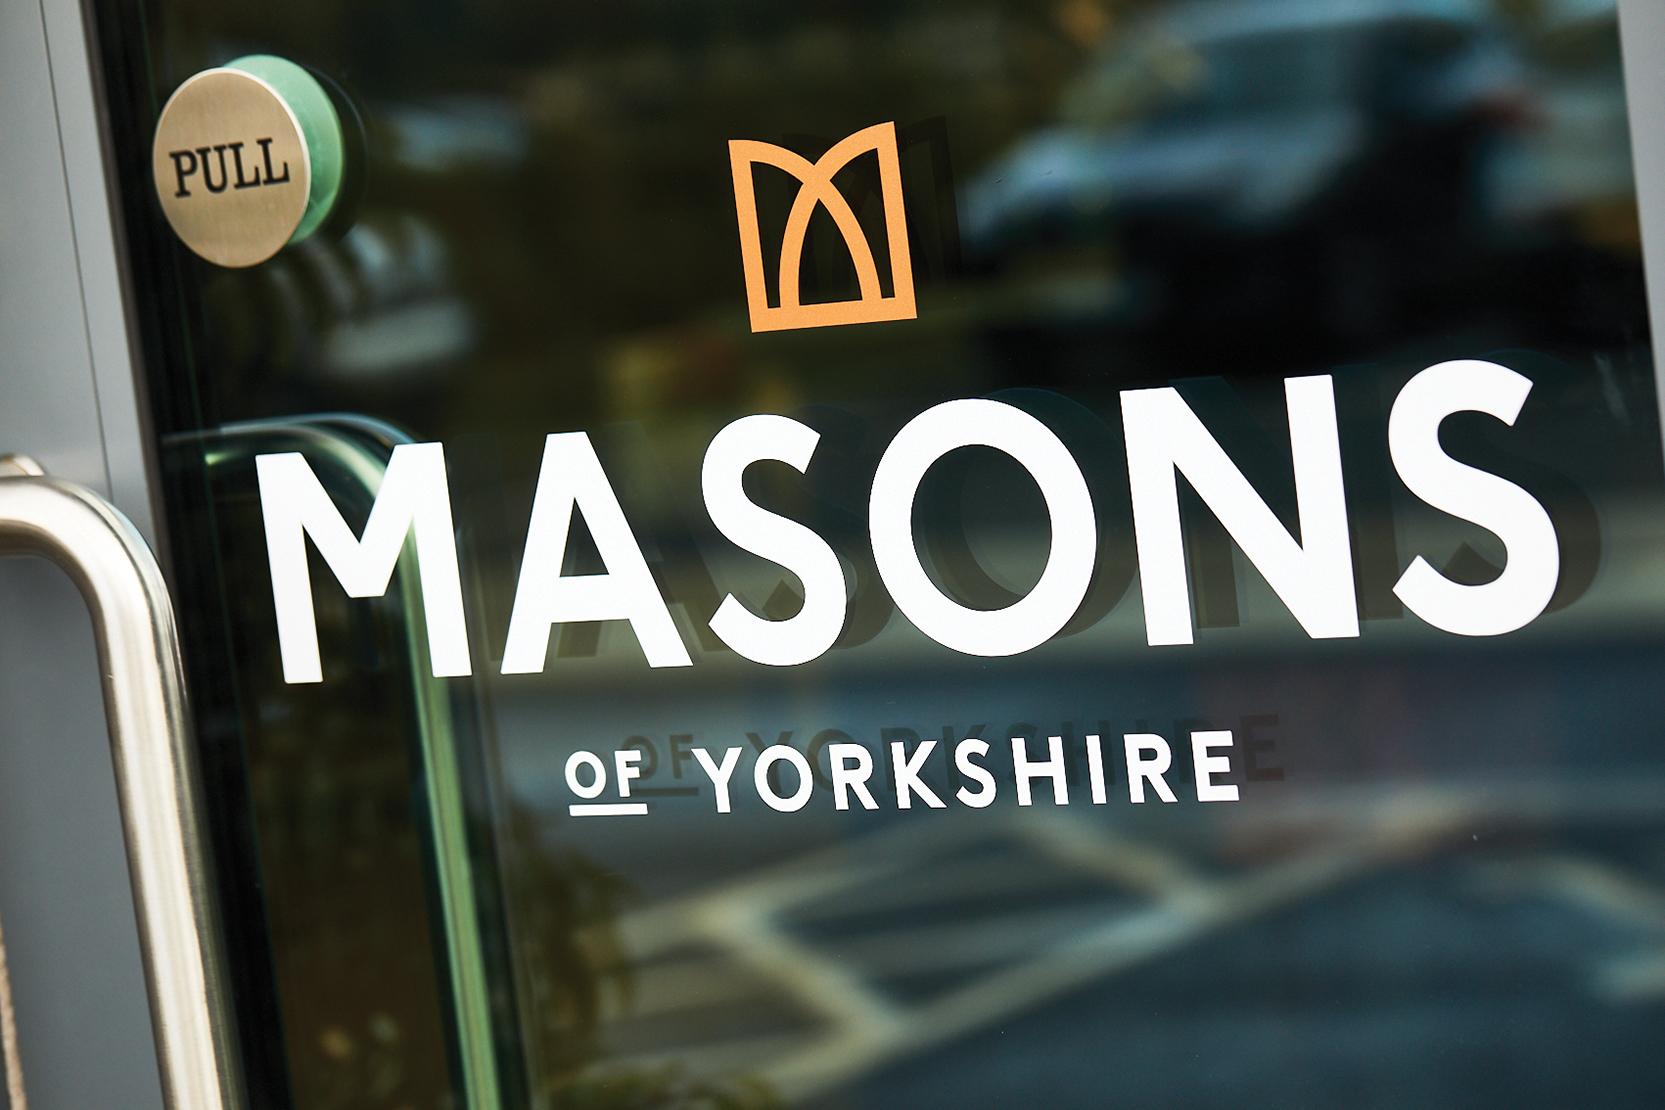 New Masons of Yorkshire distillery